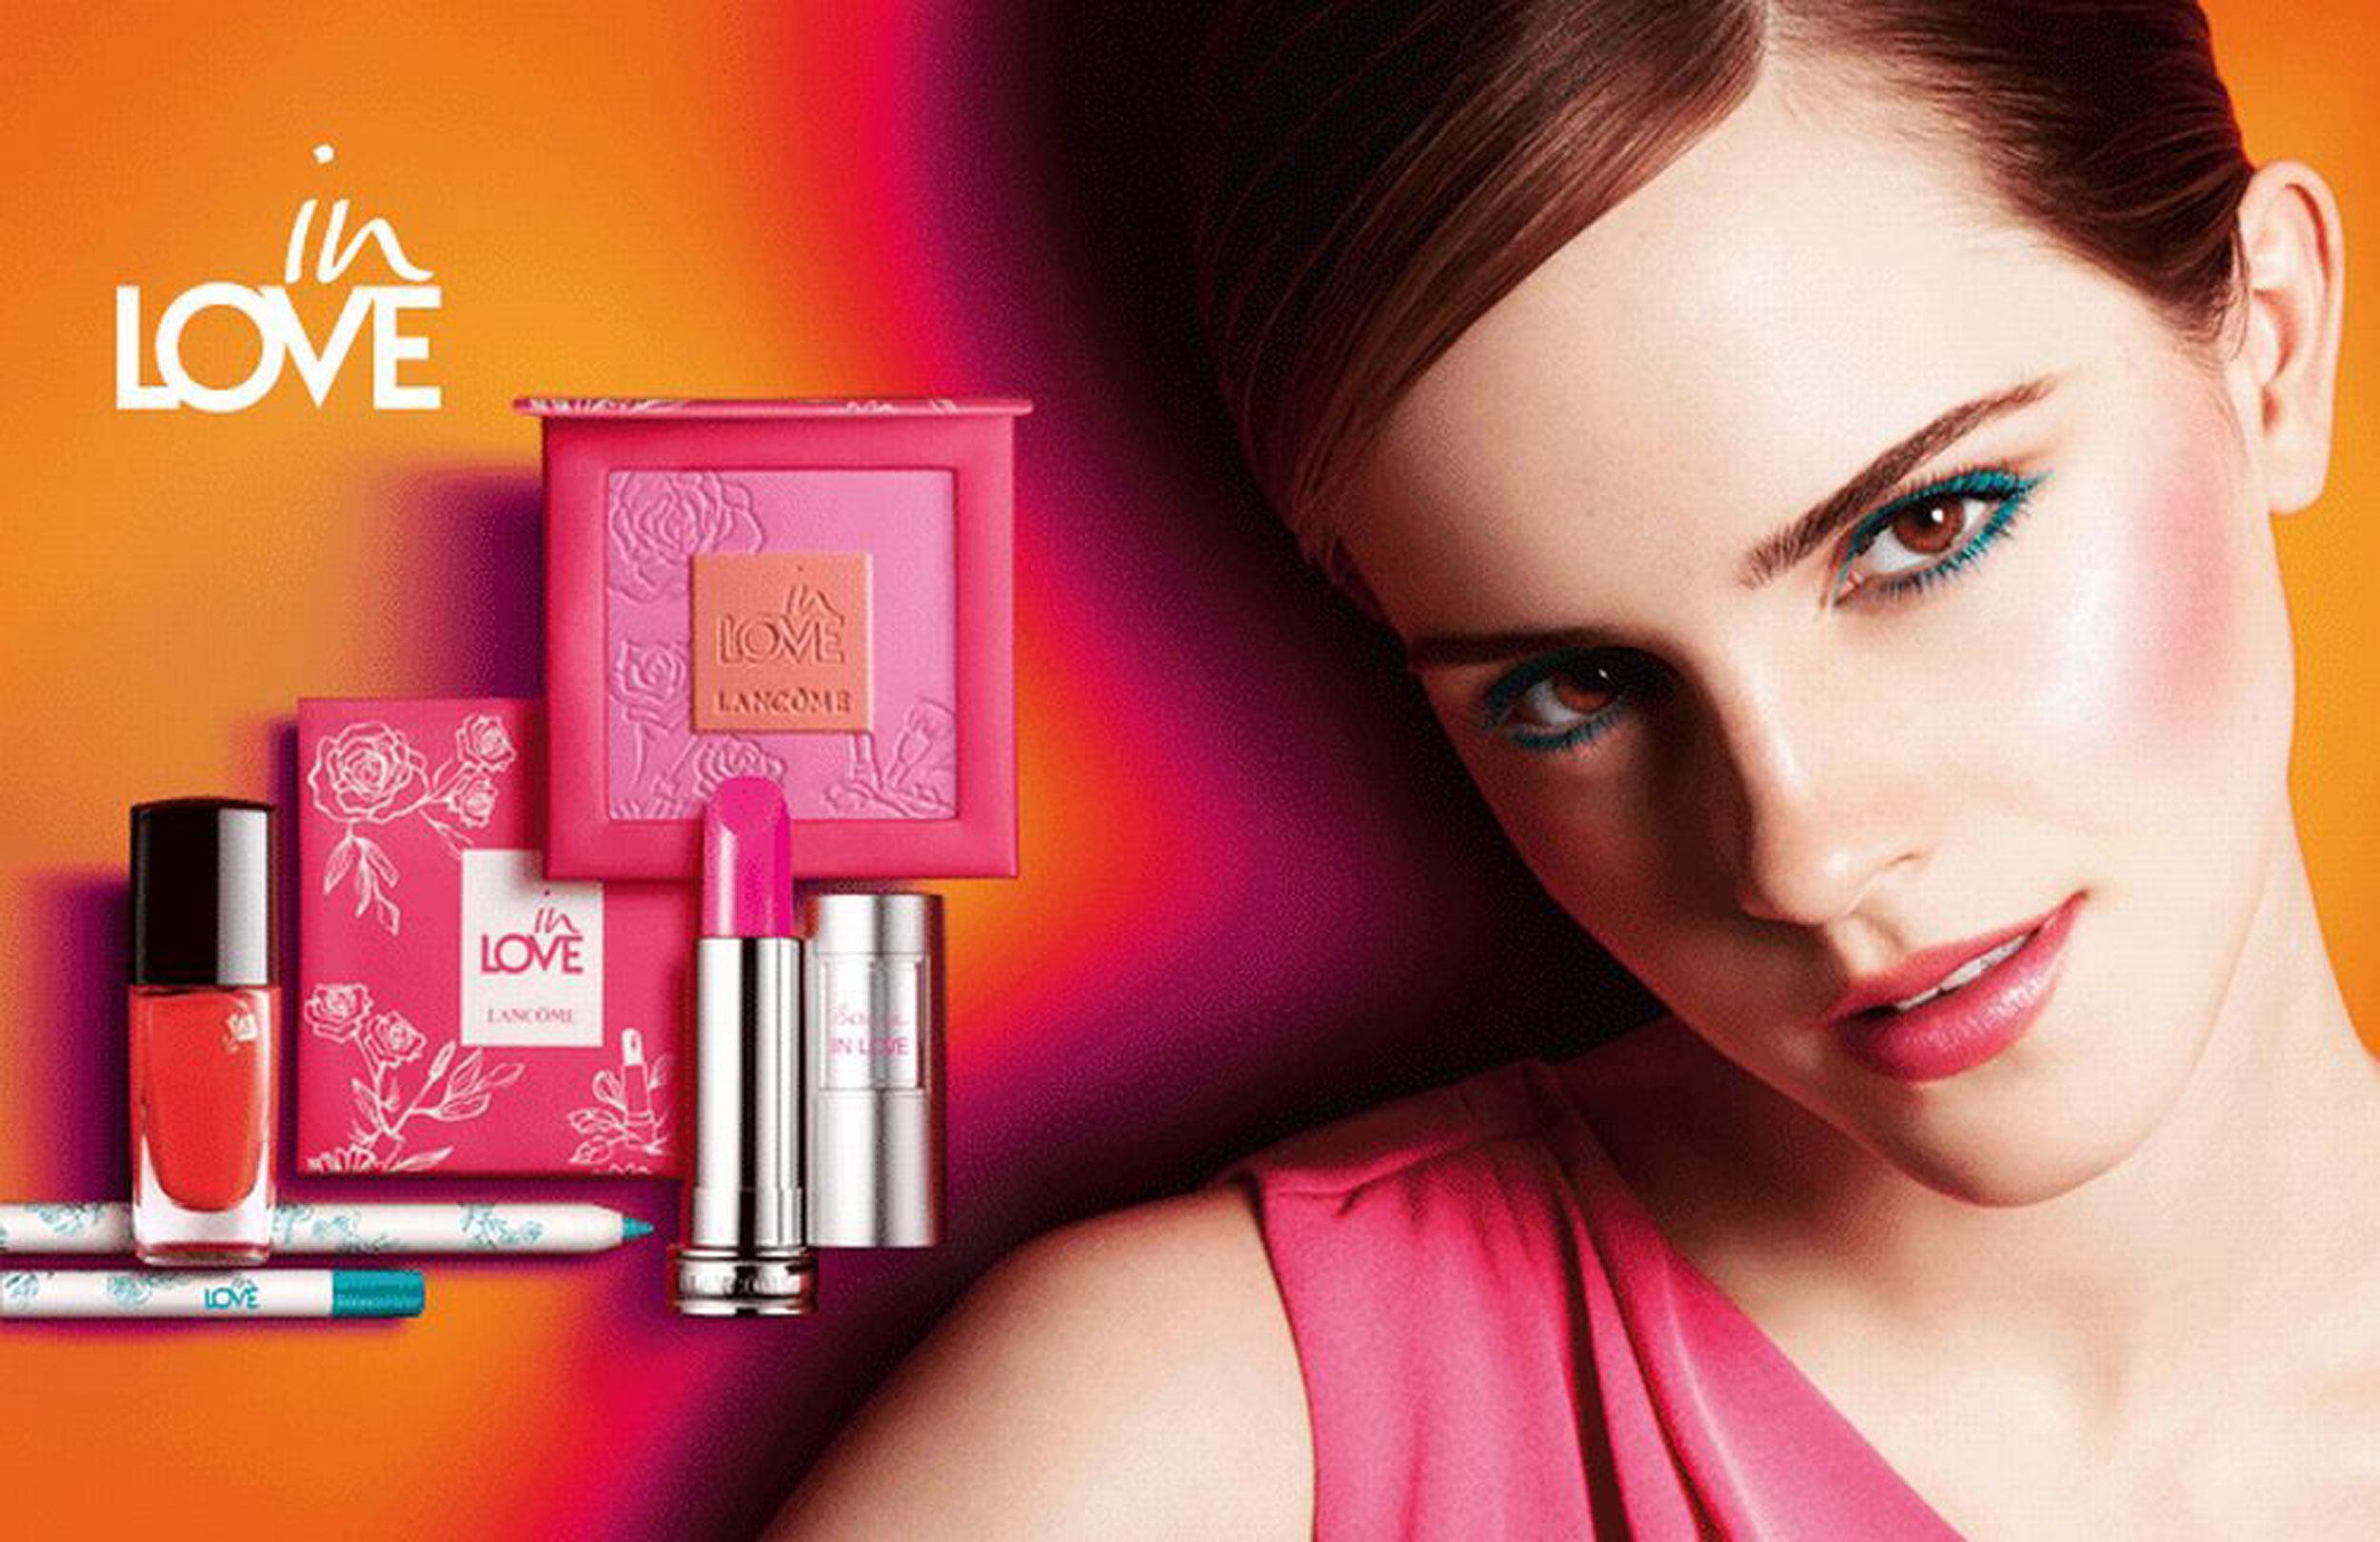 By Natasha Krezic on 15 December, 2012 Beauty & Health , Make-up